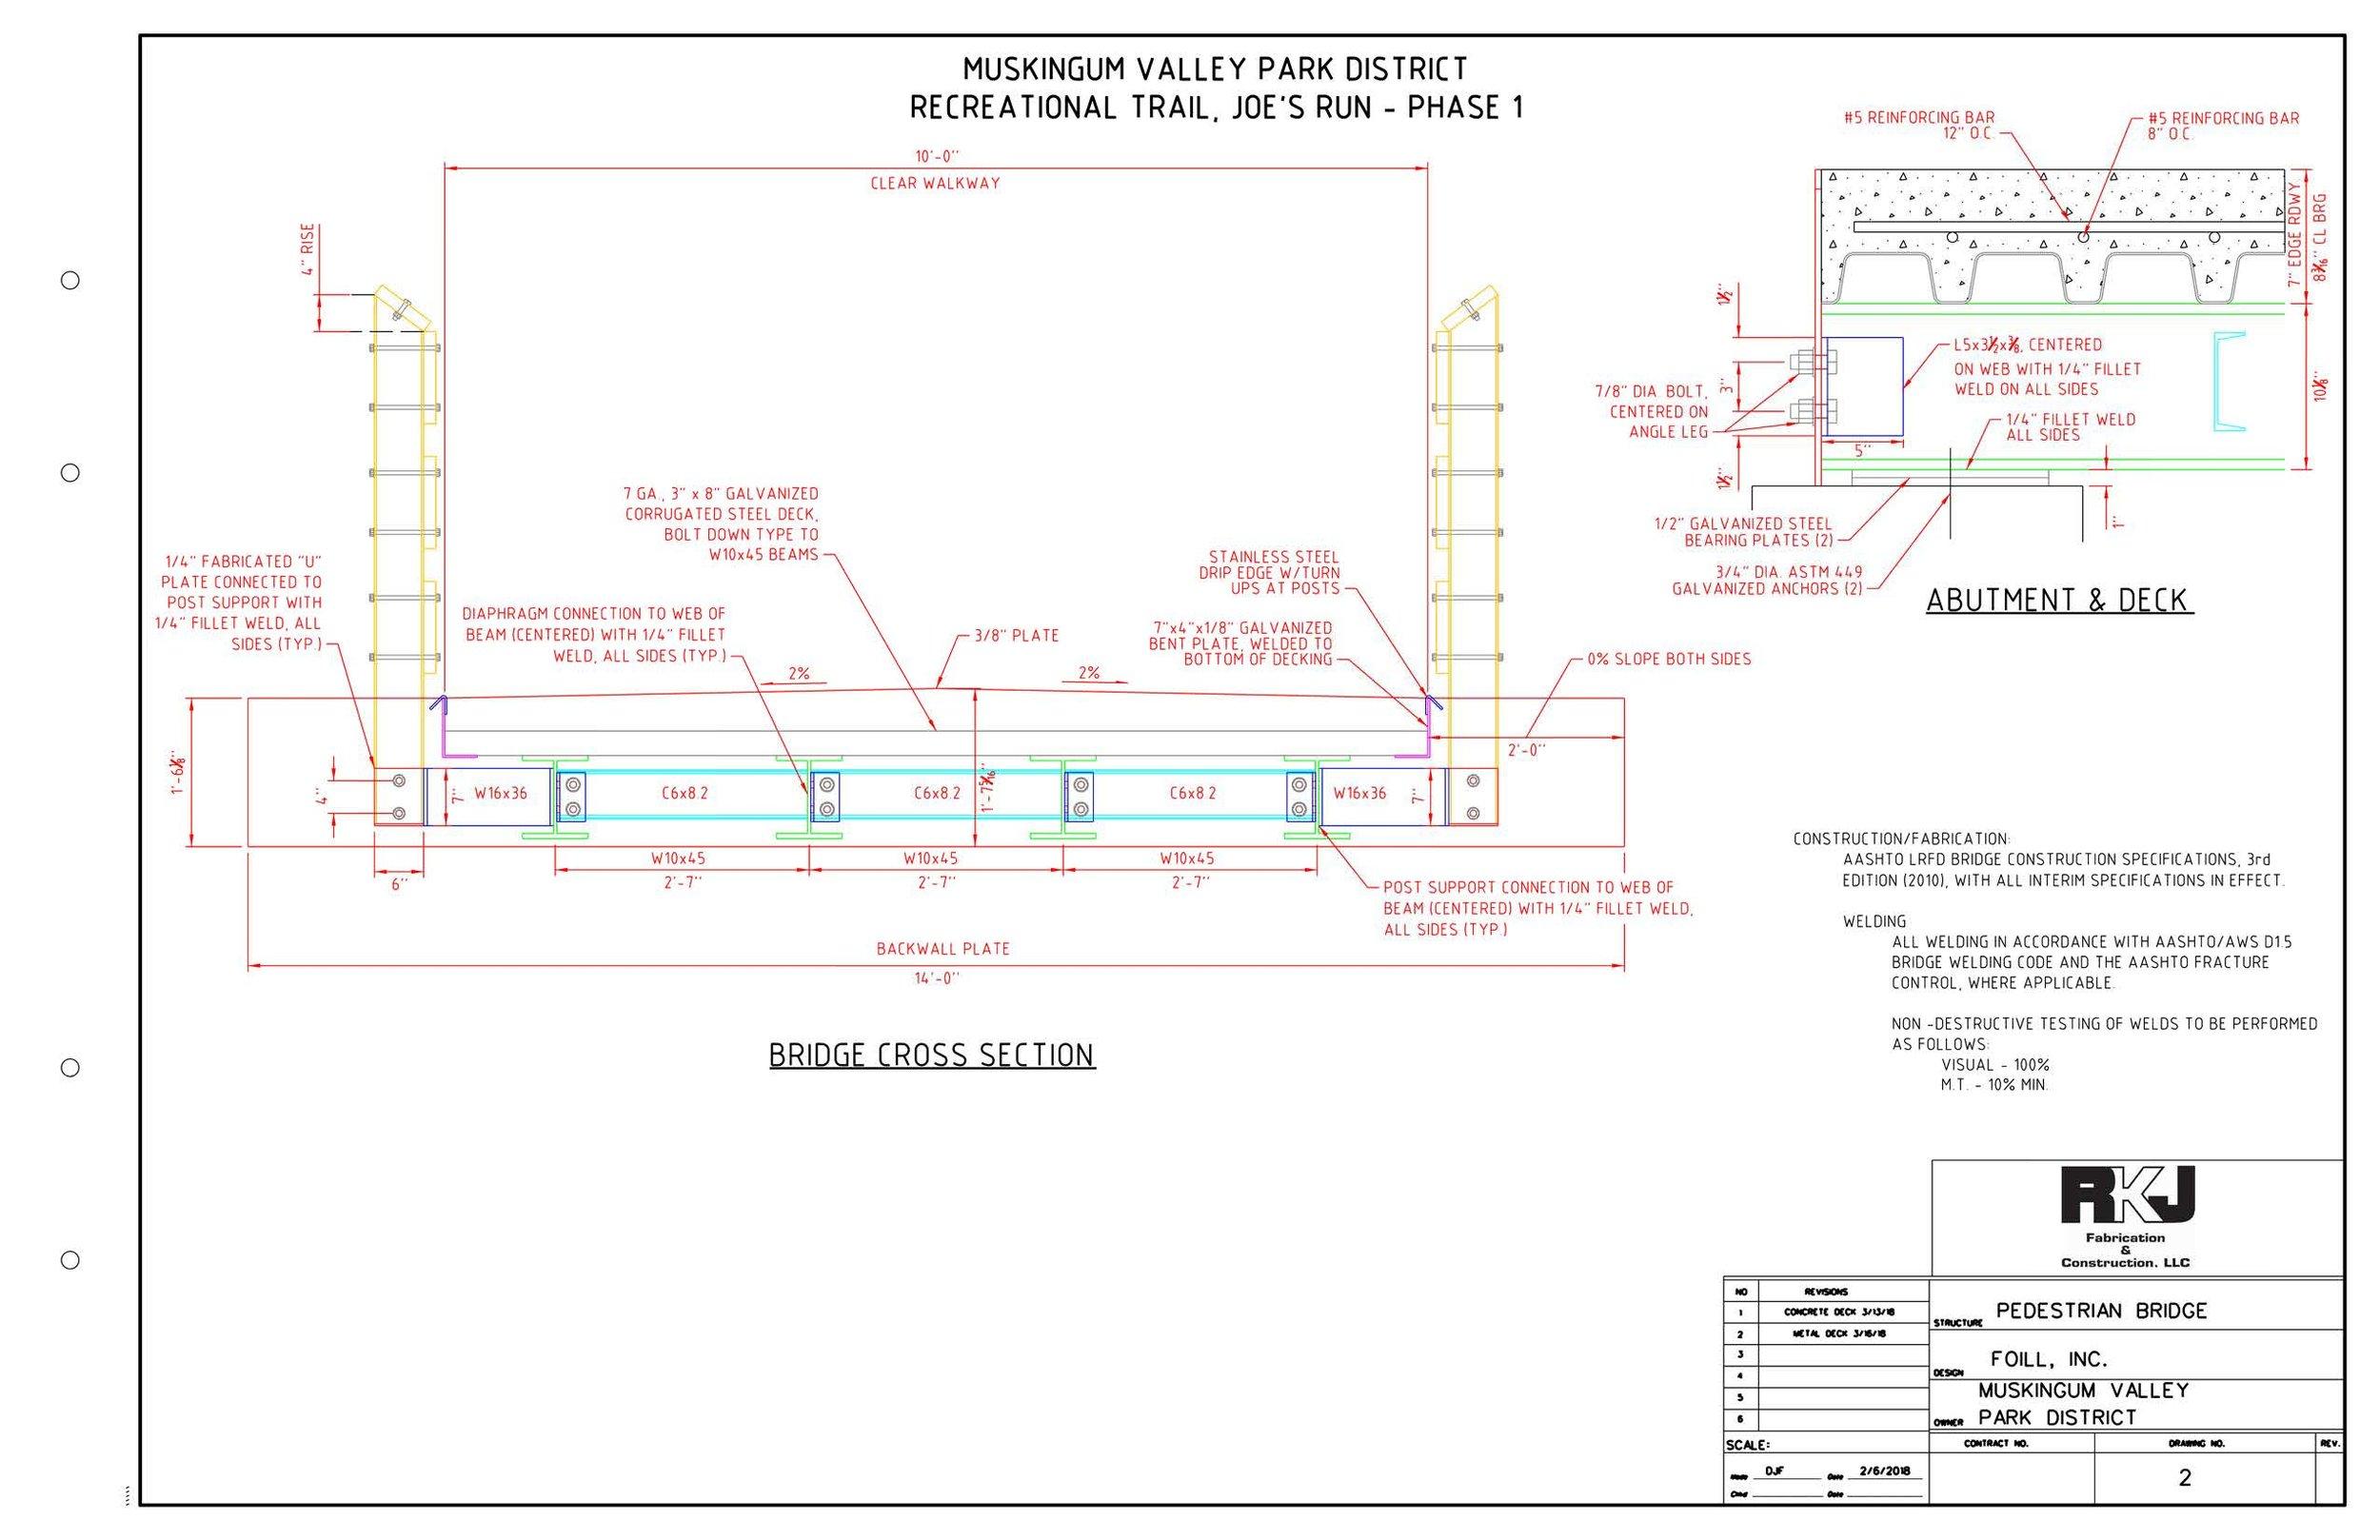 MVPD Recreational Trail, Joes Run Ph. 1,  Pedestrian Bridge Shop Drawings Rev 2_Page_2.jpg